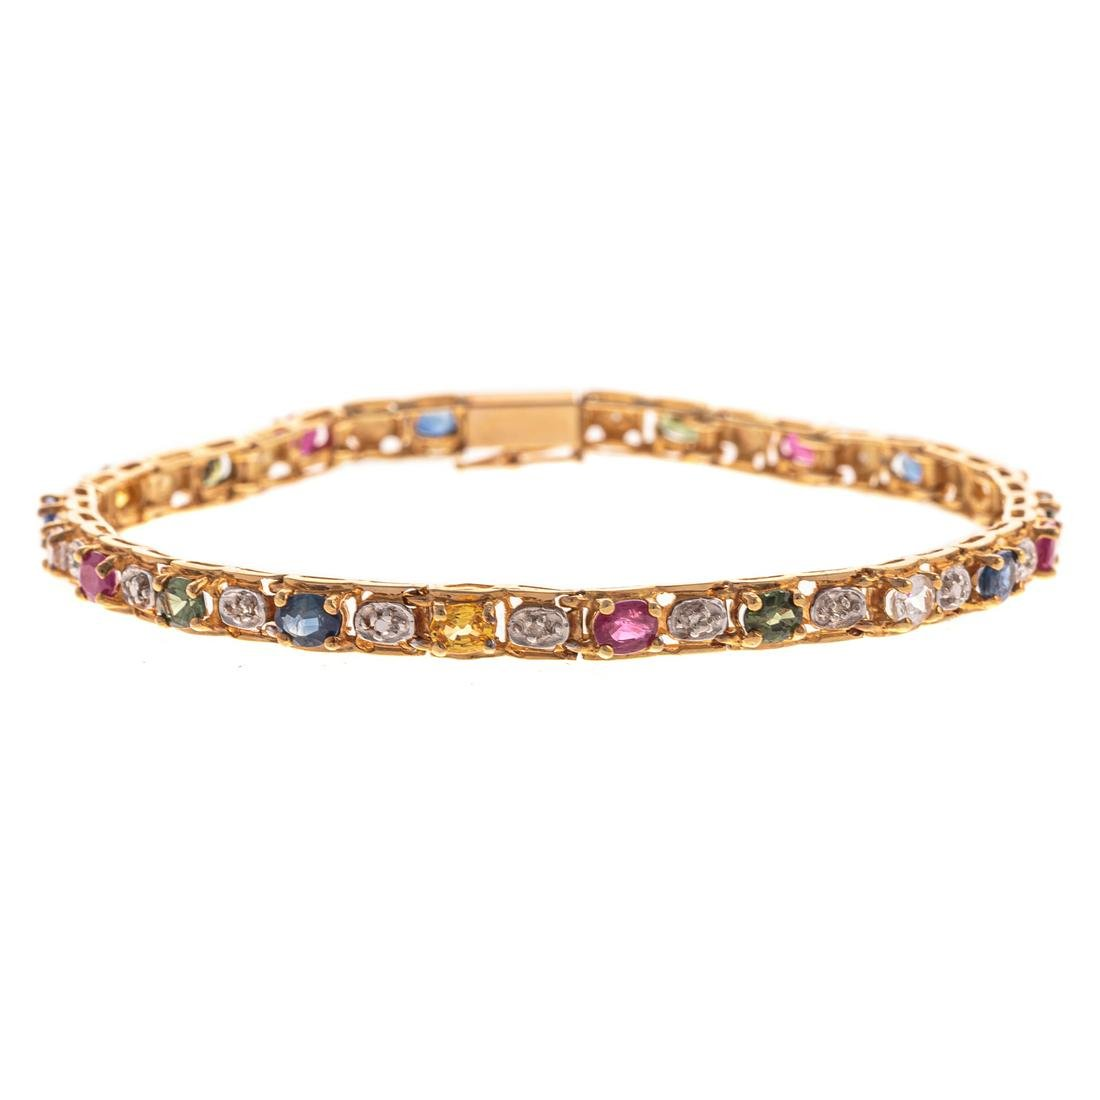 A Multi Colored Gemstone & Diamond Bracelet in 14K